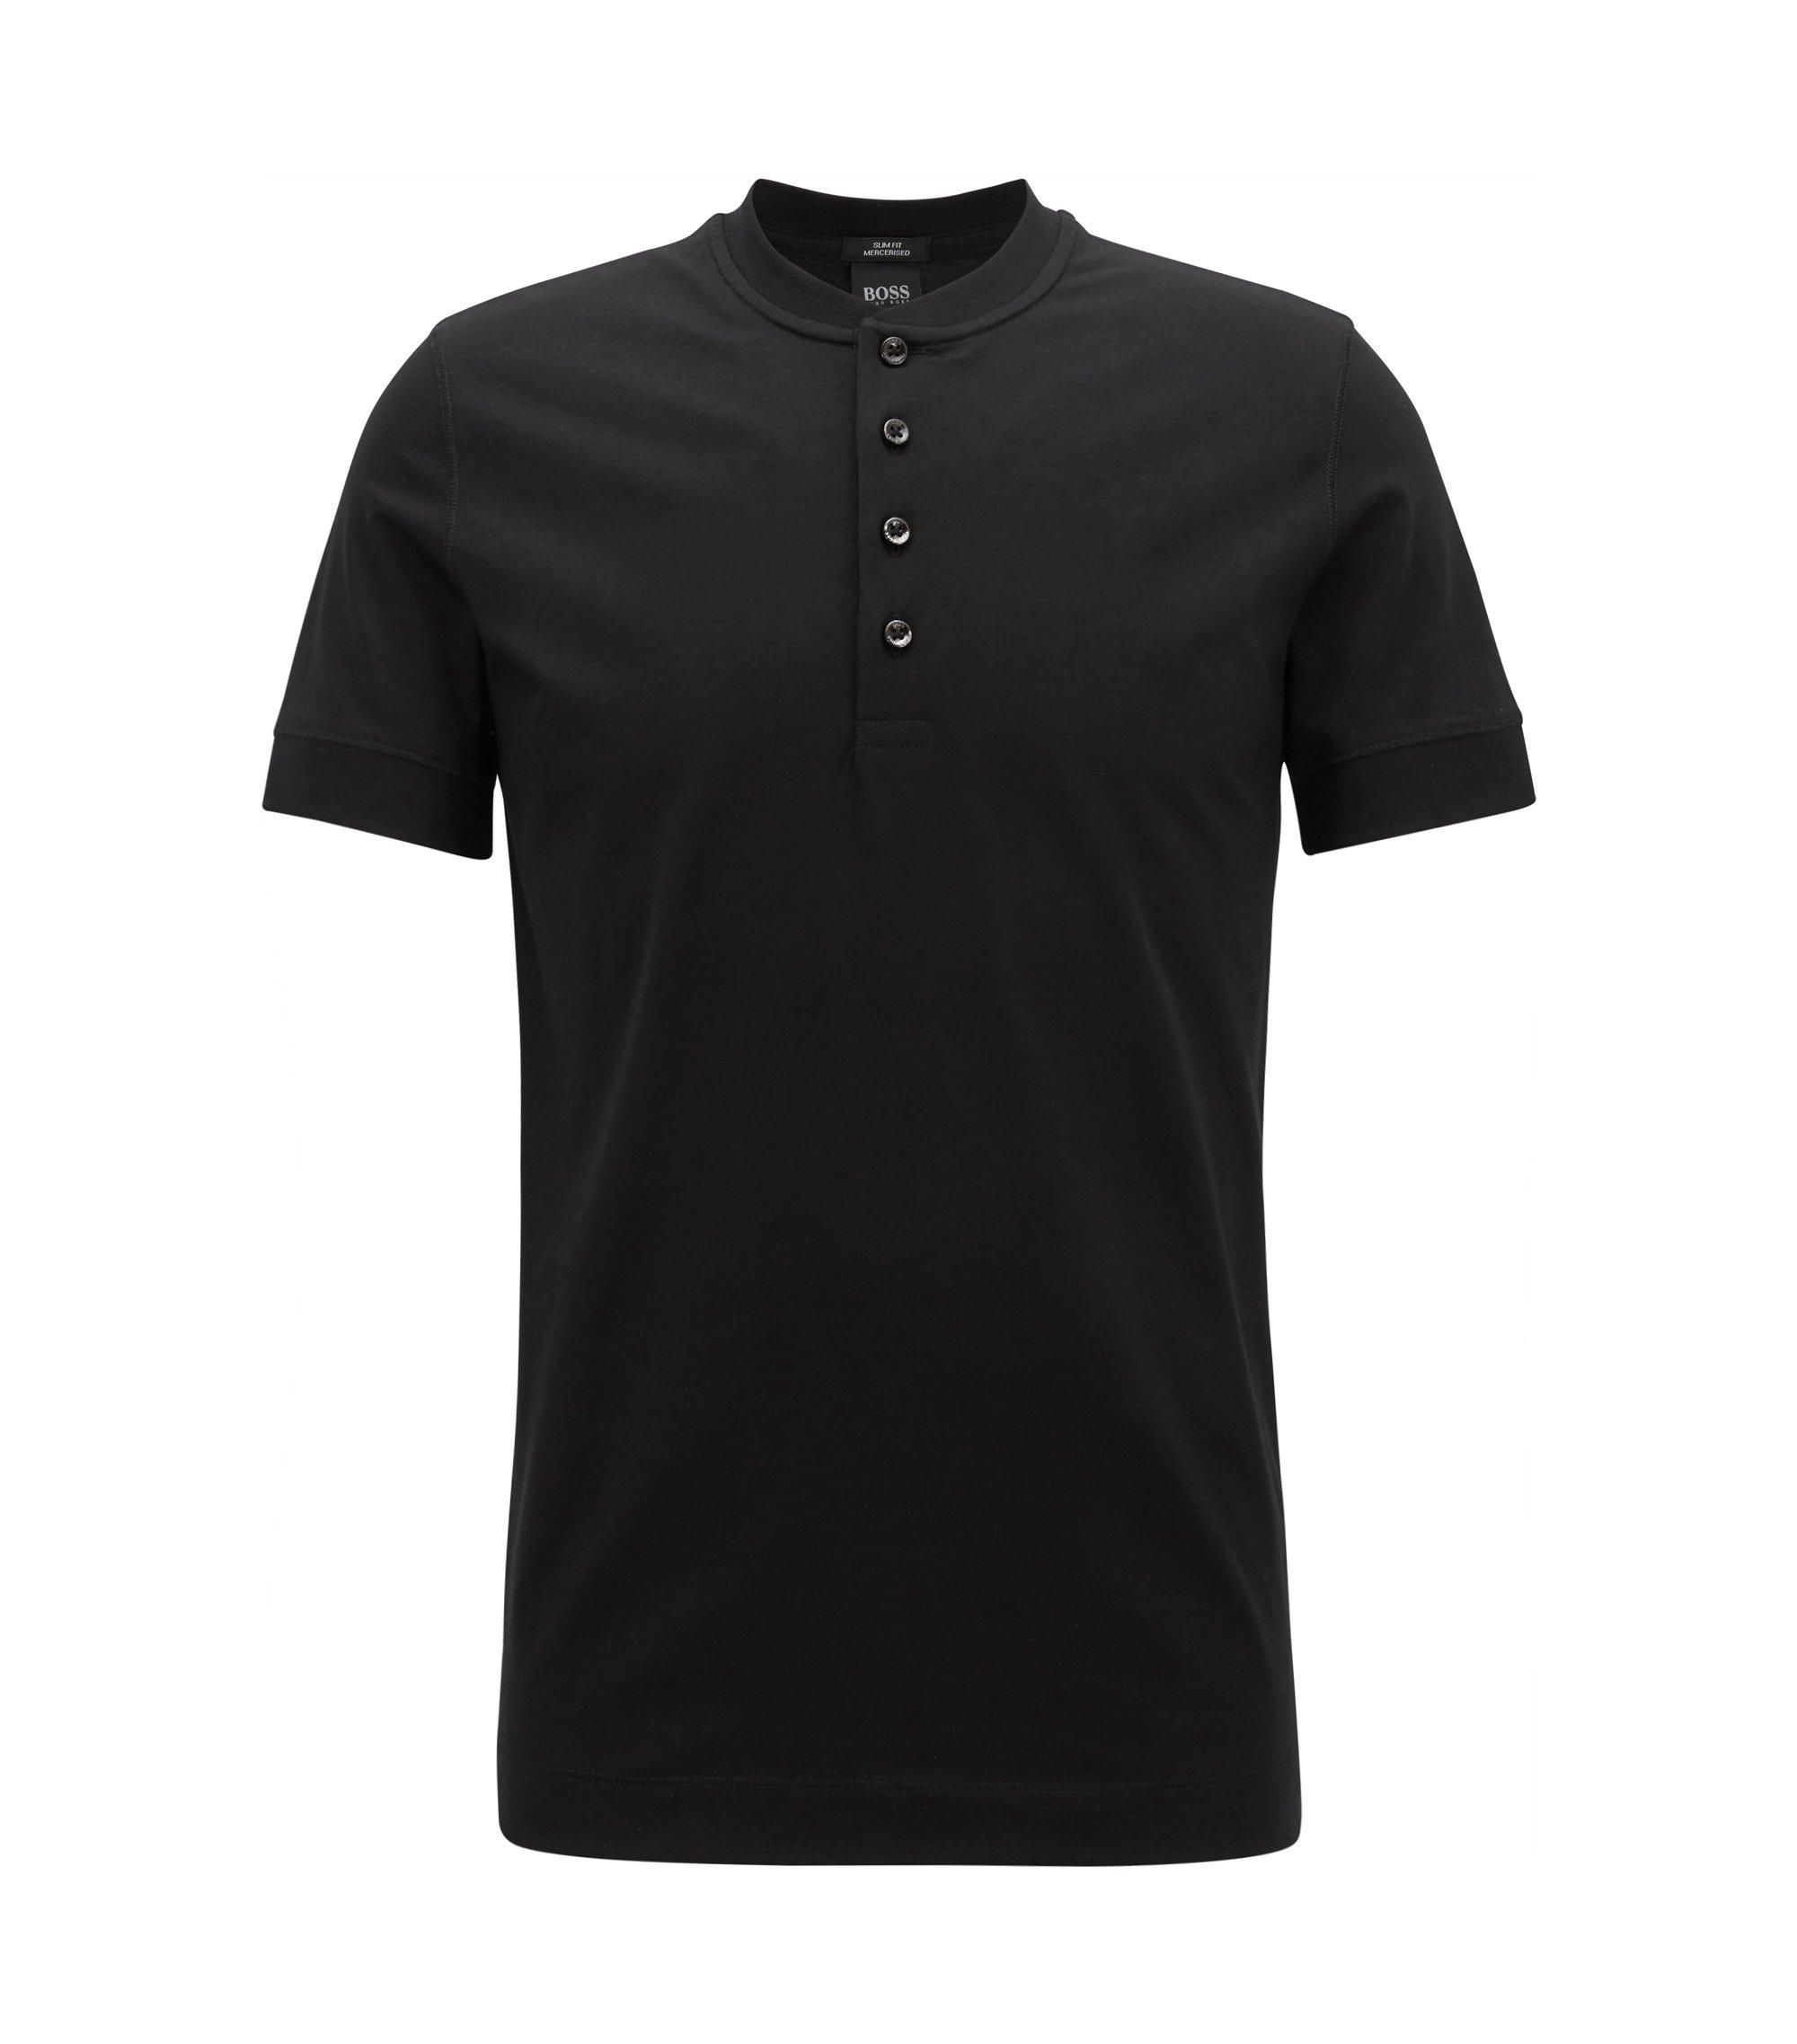 Slim-fit Henley T-shirt in mercerised jersey, Black